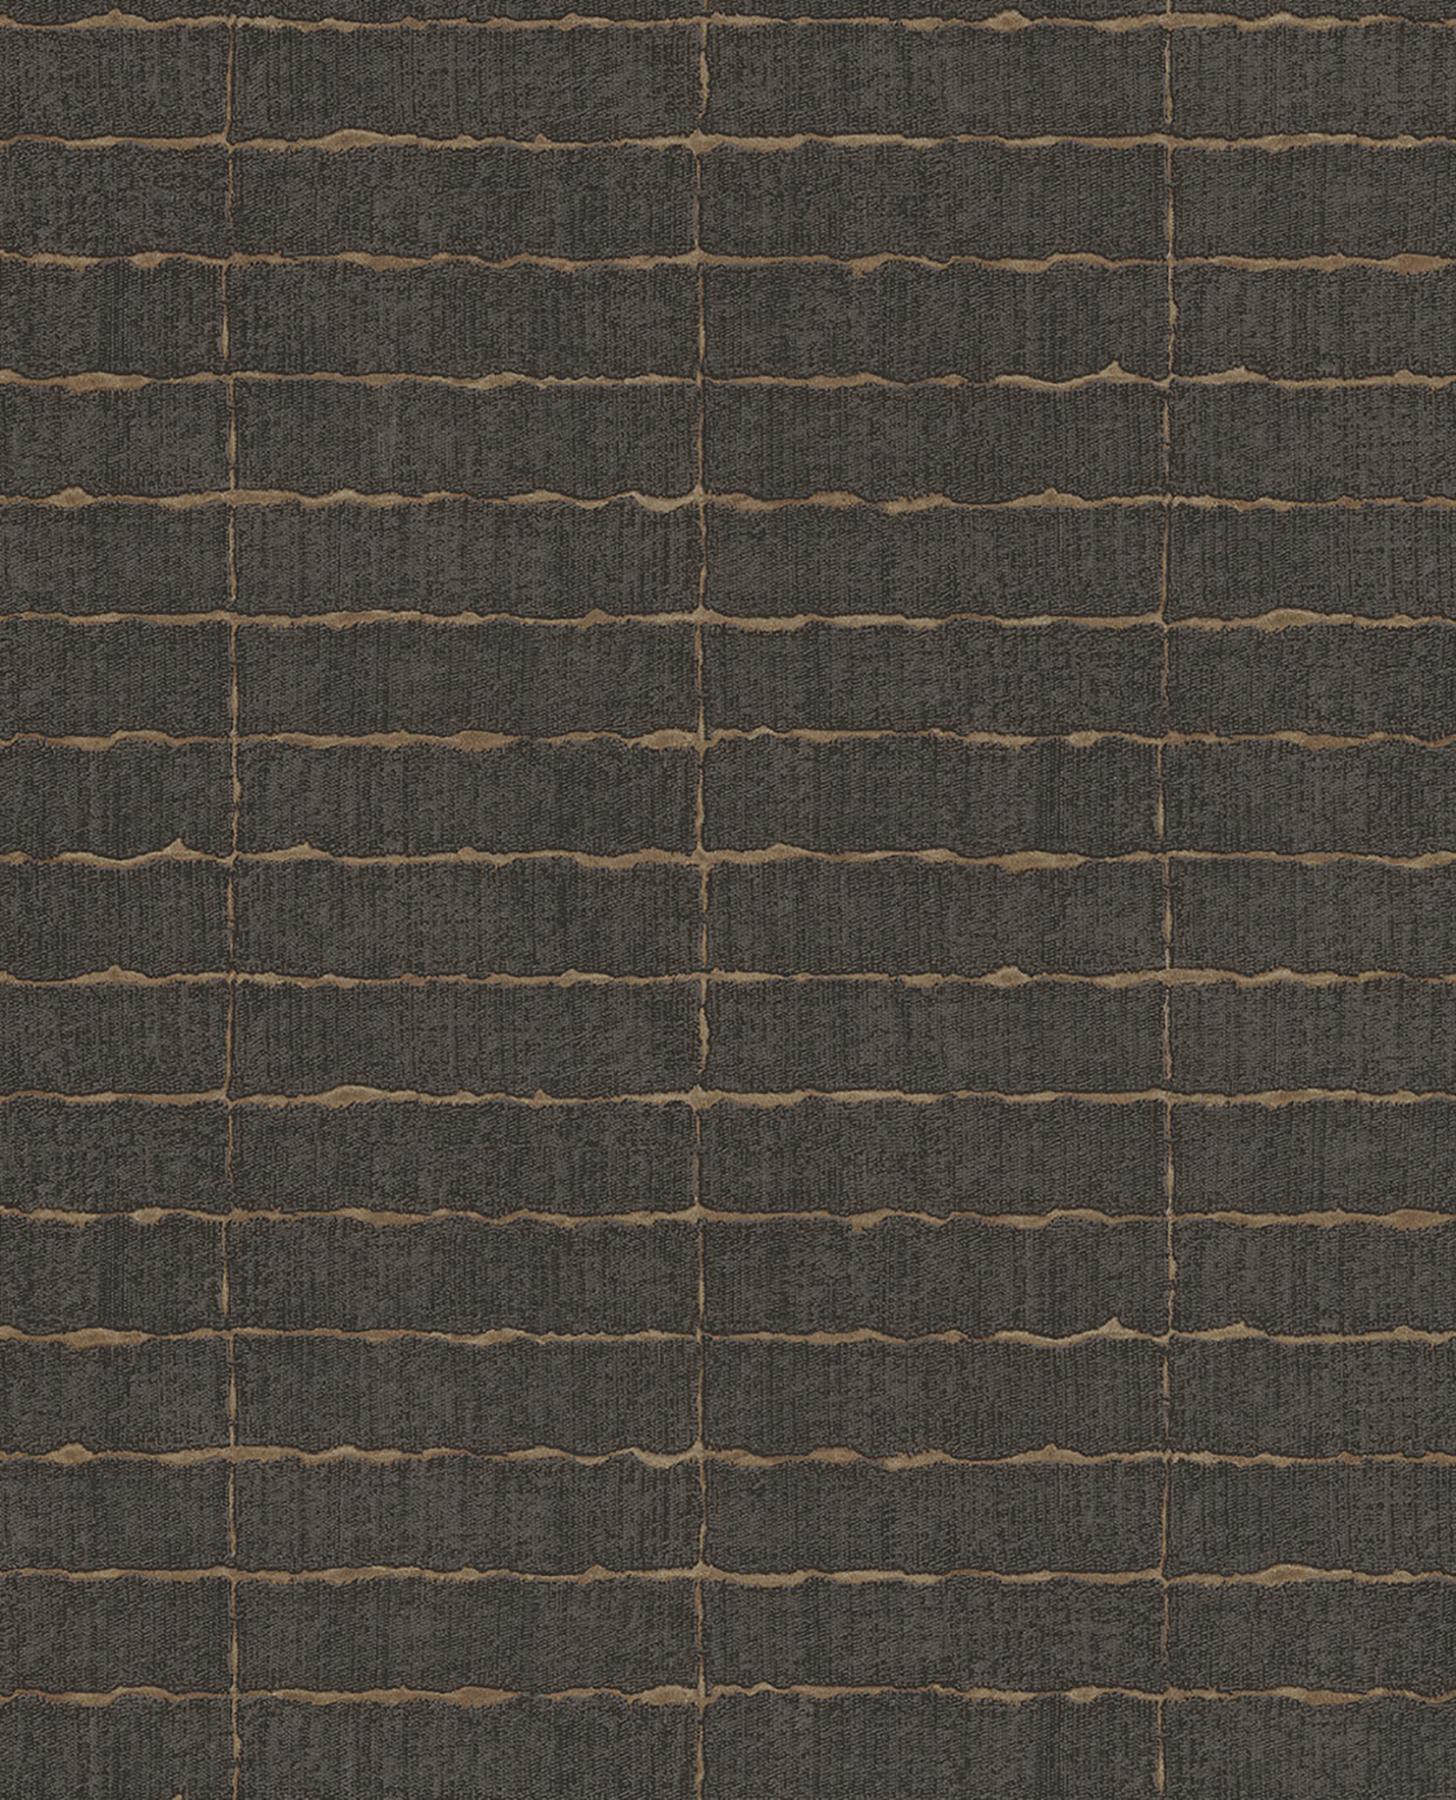 Picture of Batna Dark Brown Brick Wallpaper